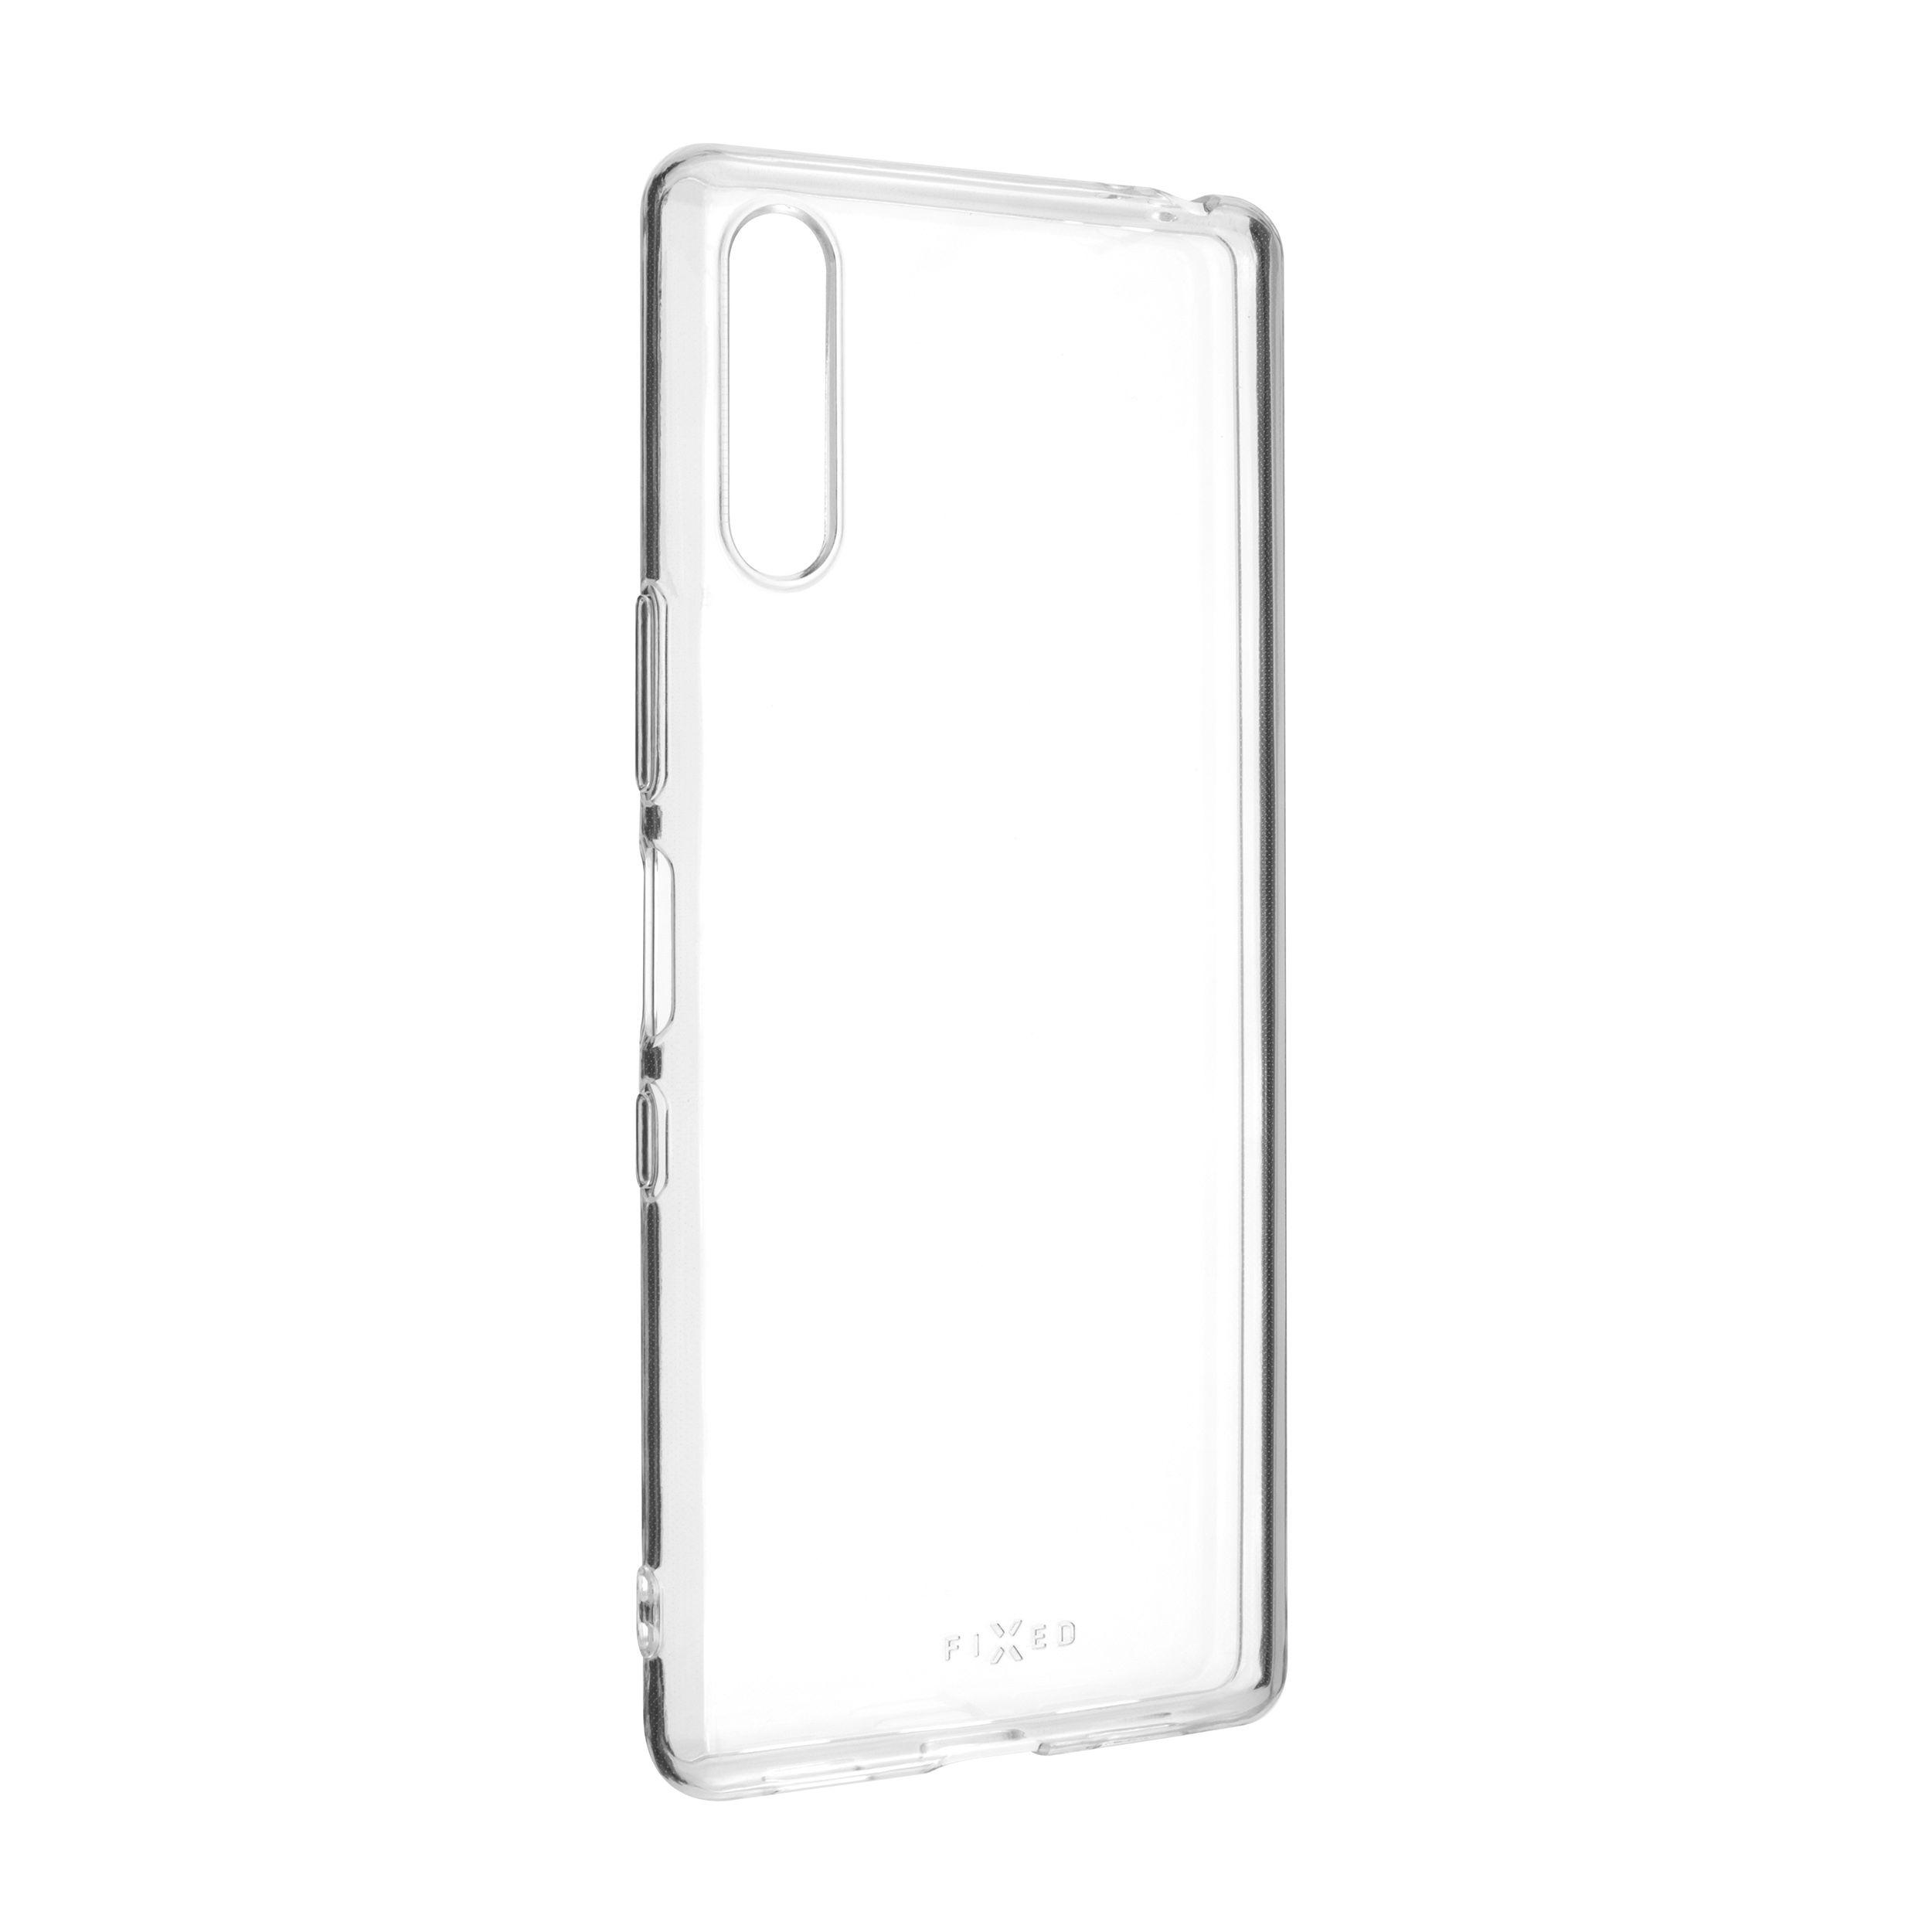 Ultratenké TPU gelové pouzdro FIXED Skin pro Sony Xperia L4, 0,6 mm, čiré